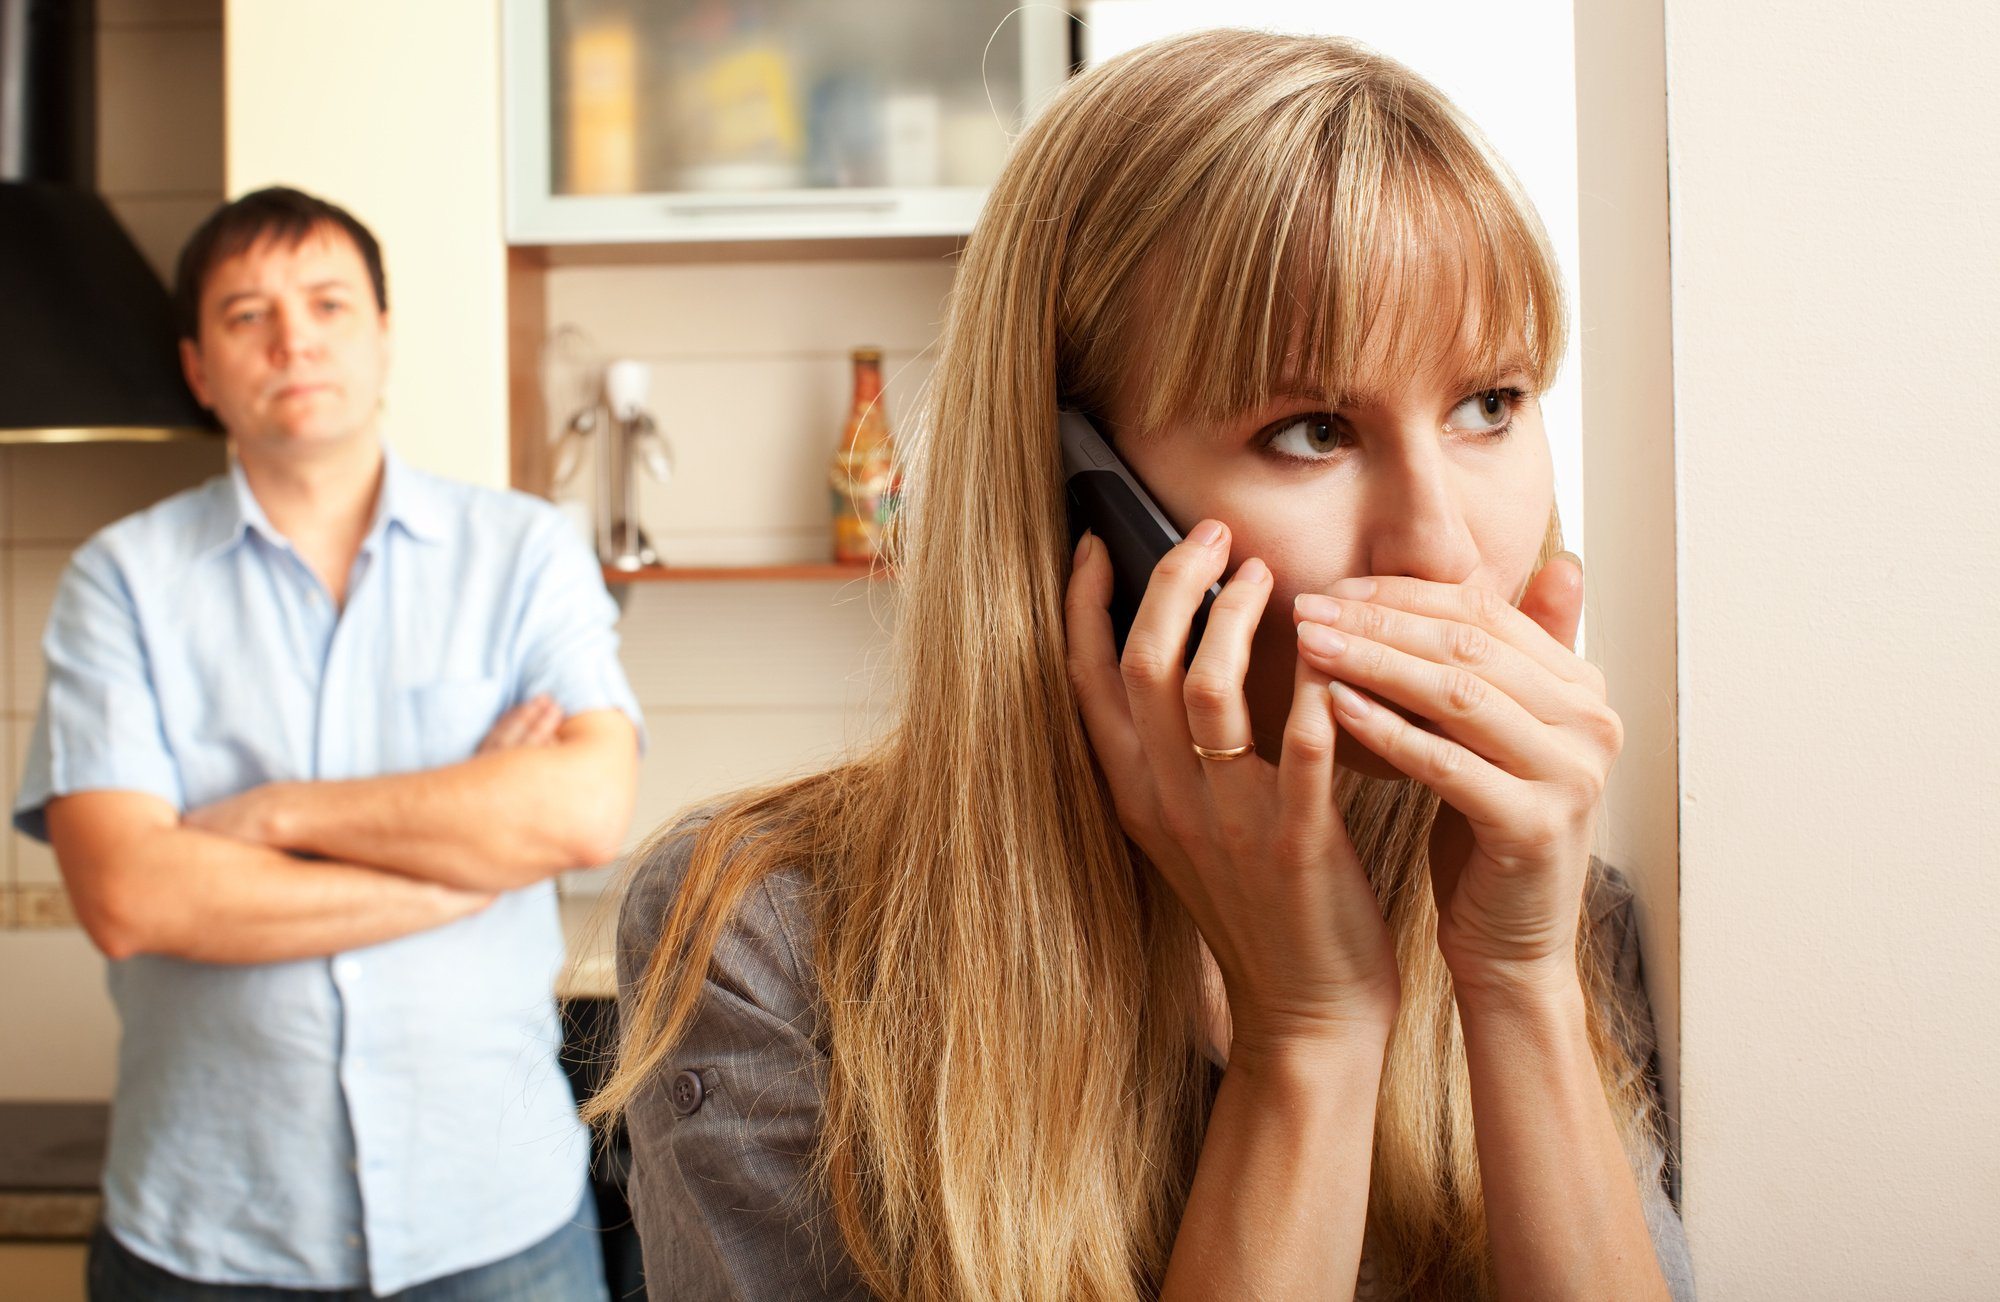 Infidelity Surveillance